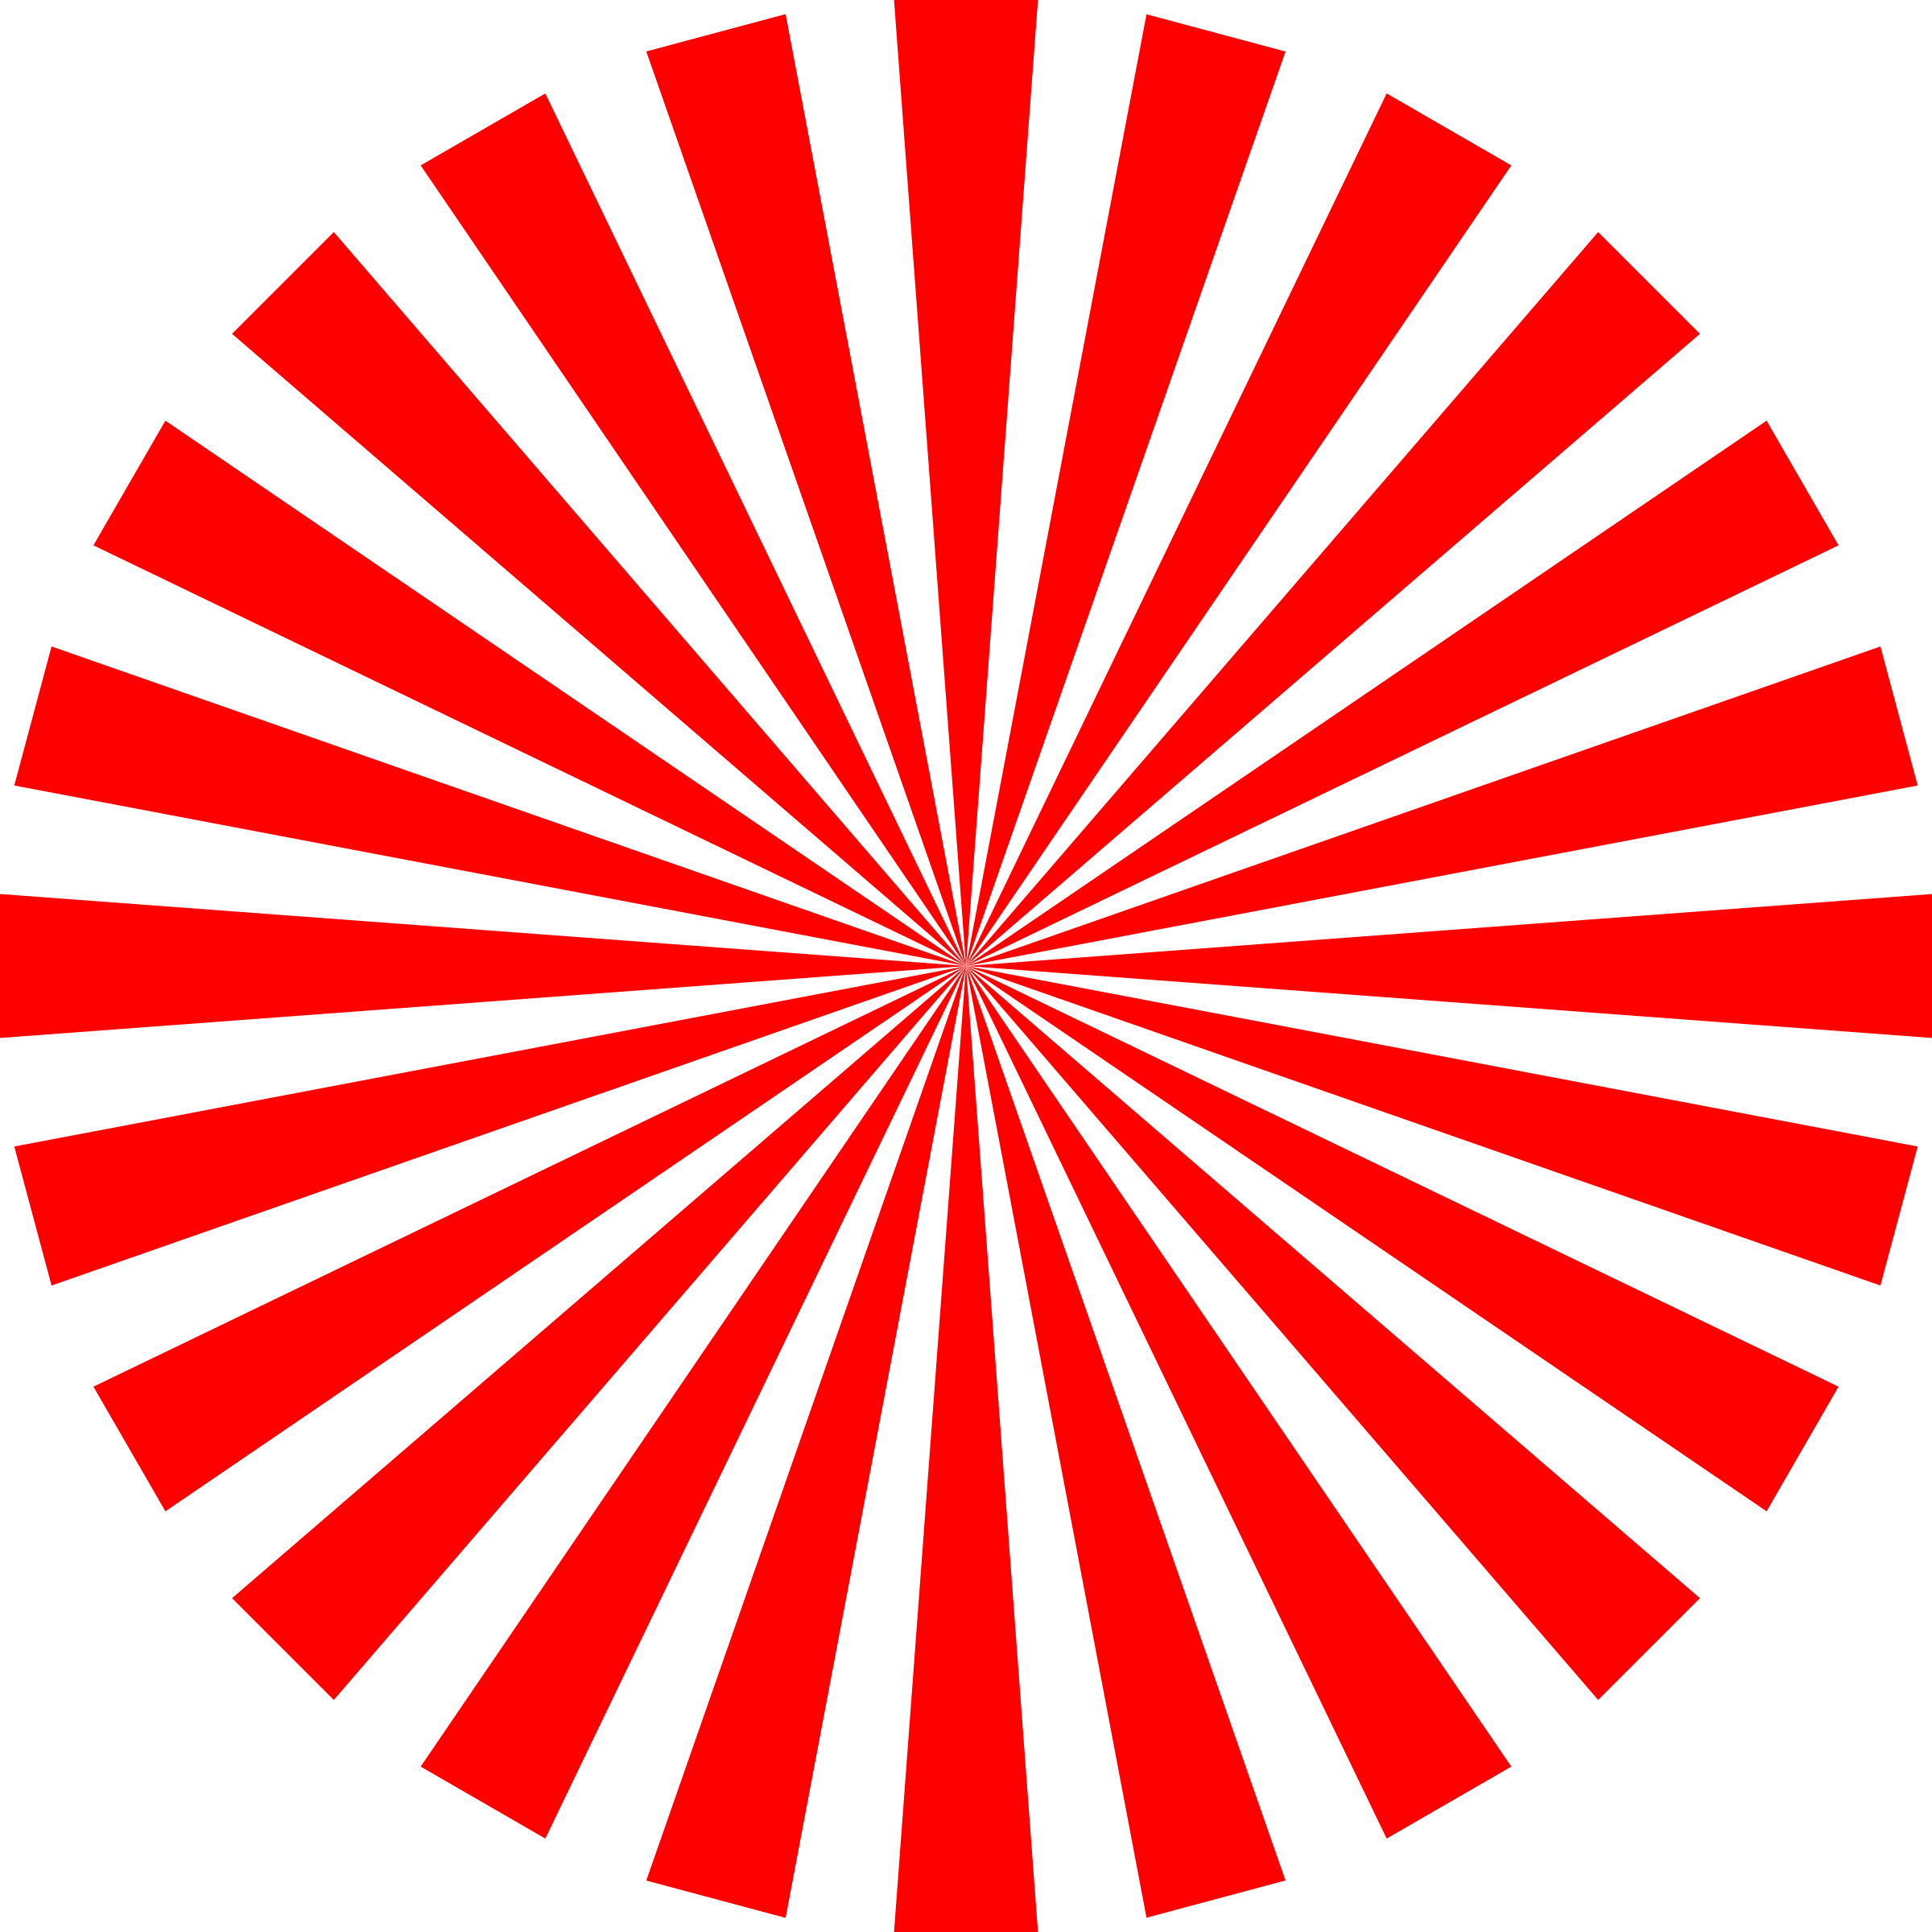 Burst clipart advertising. Basic red star icons